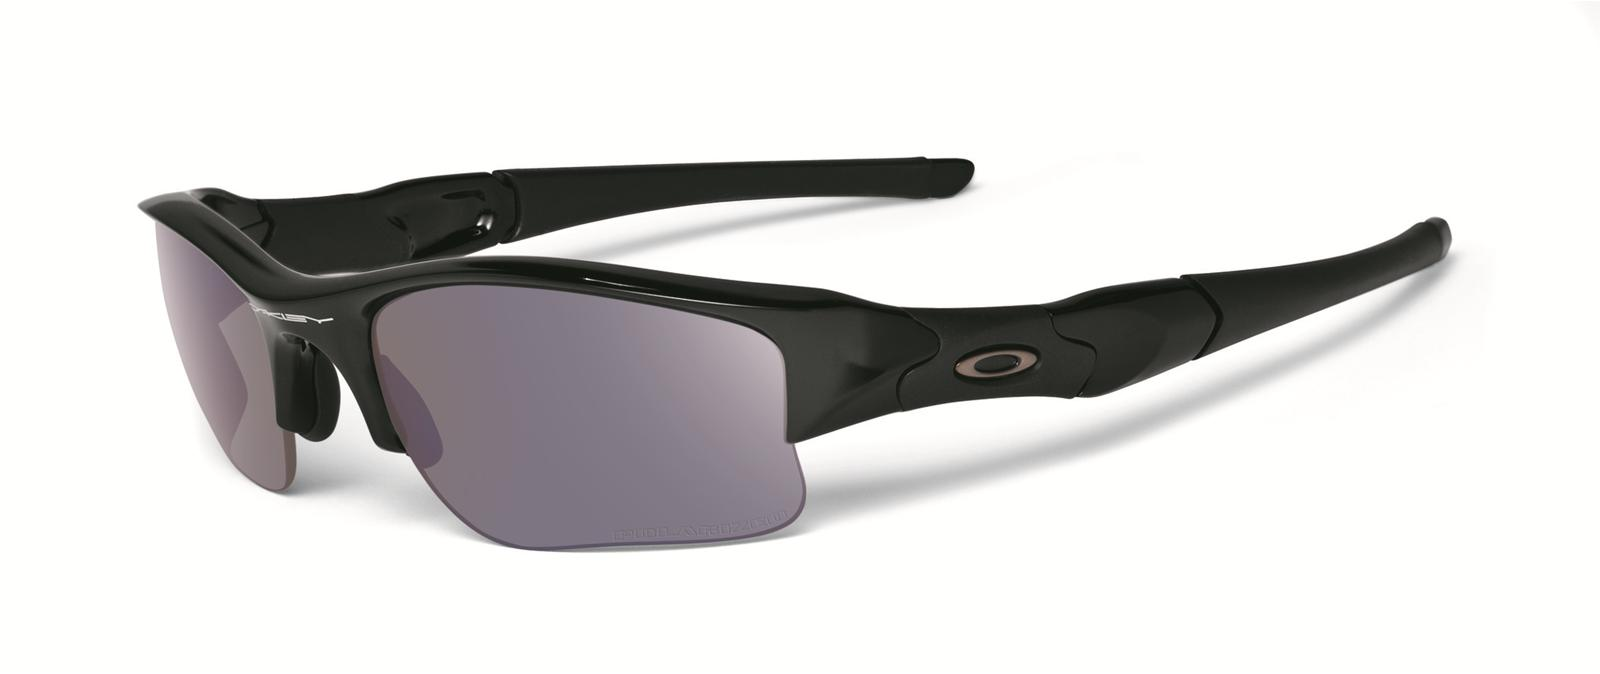 Oakley Polarized Sunglasses Fishing